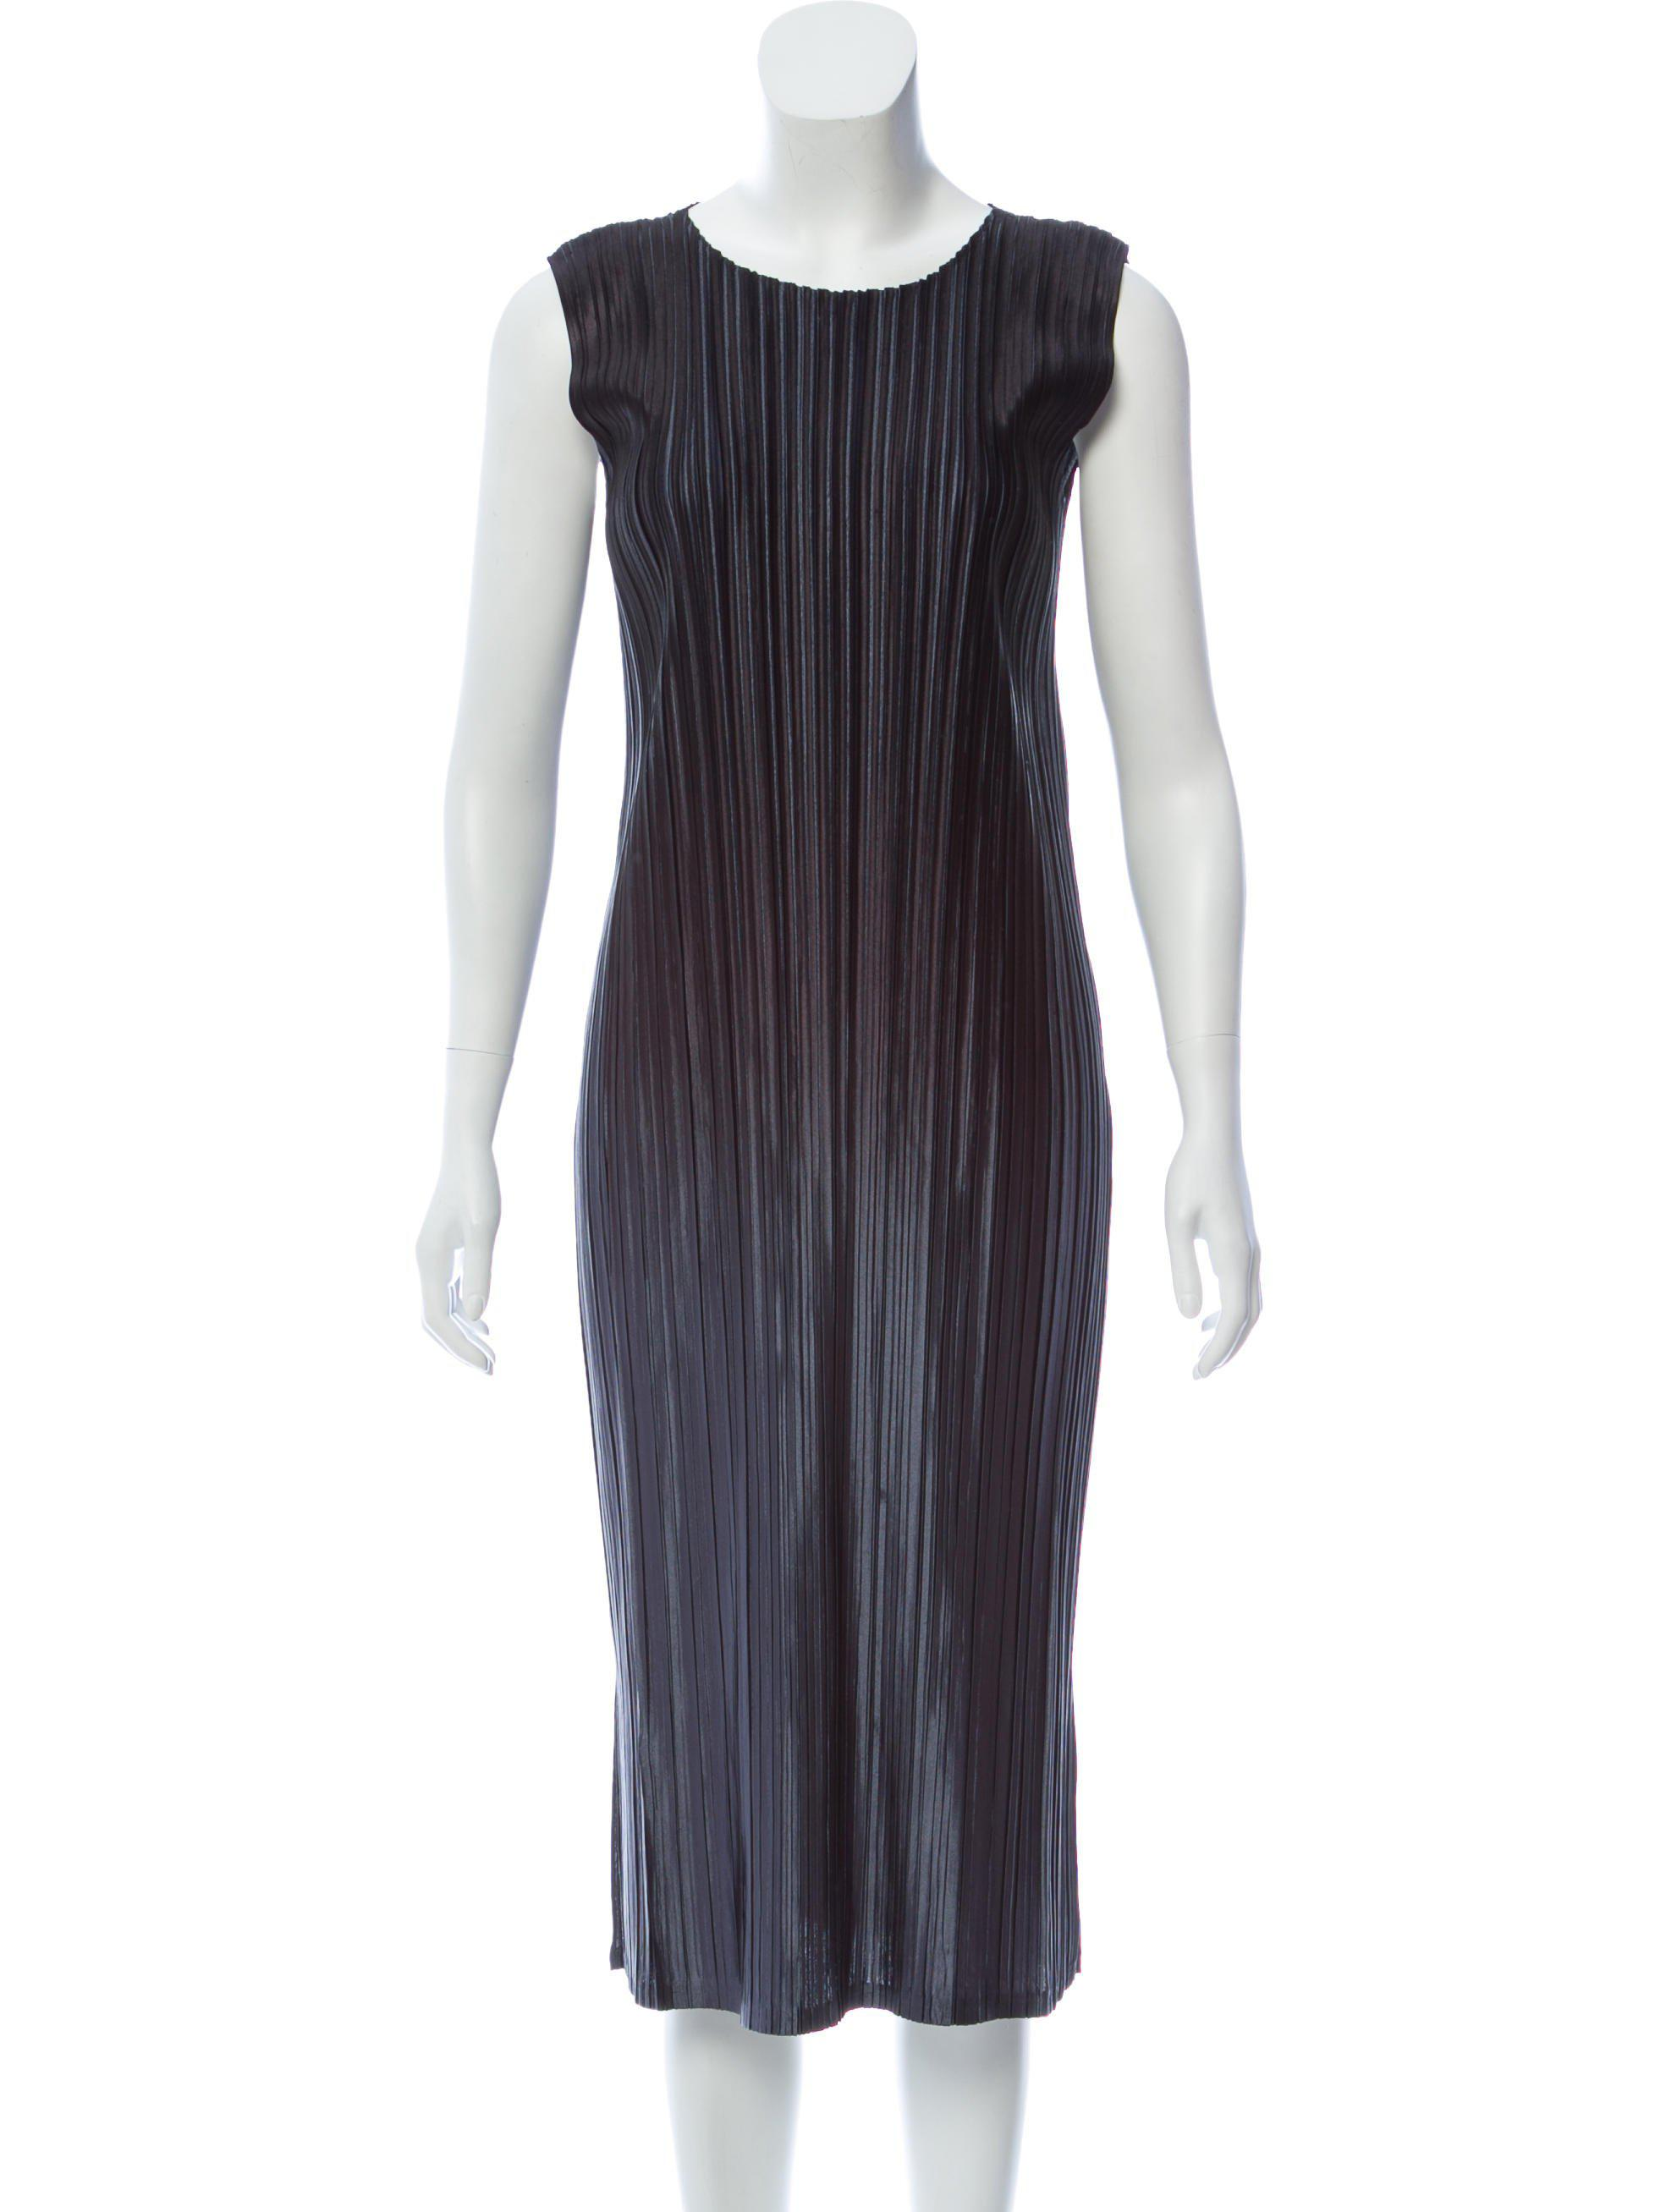 e8b8a4ac13 Lyst - Pleats Please Issey Miyake Plissé Maxi Dress Black in Metallic